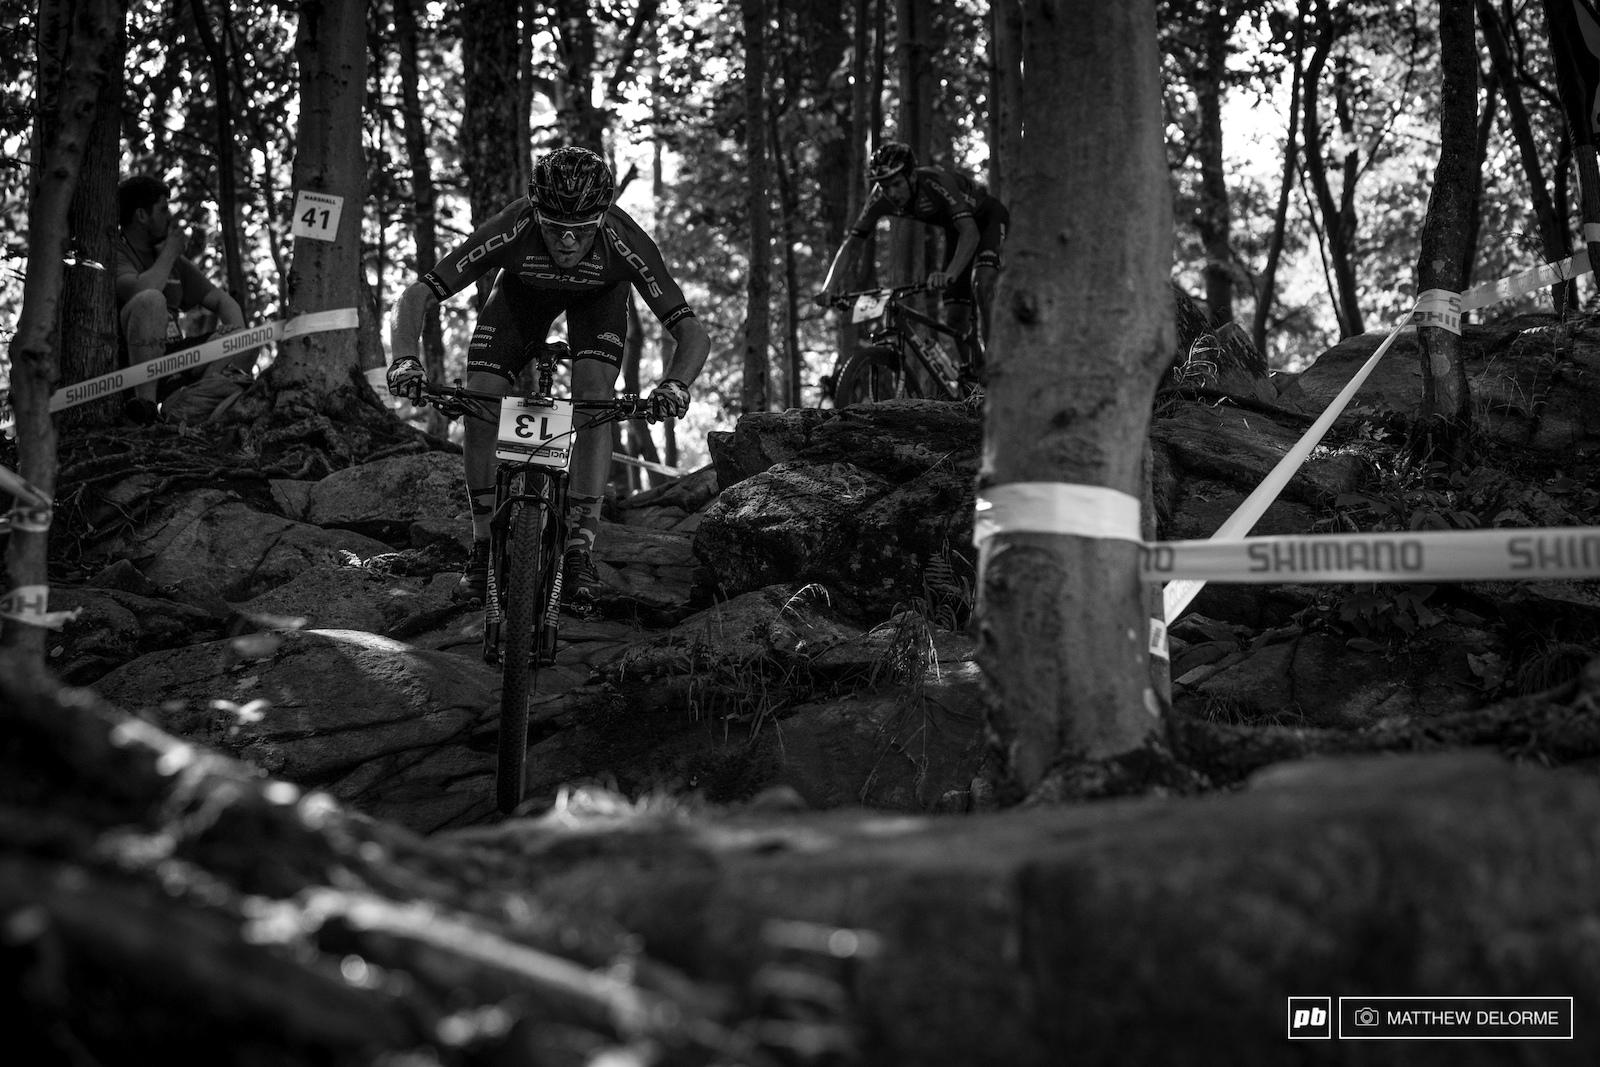 Florian Vogel charging through a dry La Patriote.